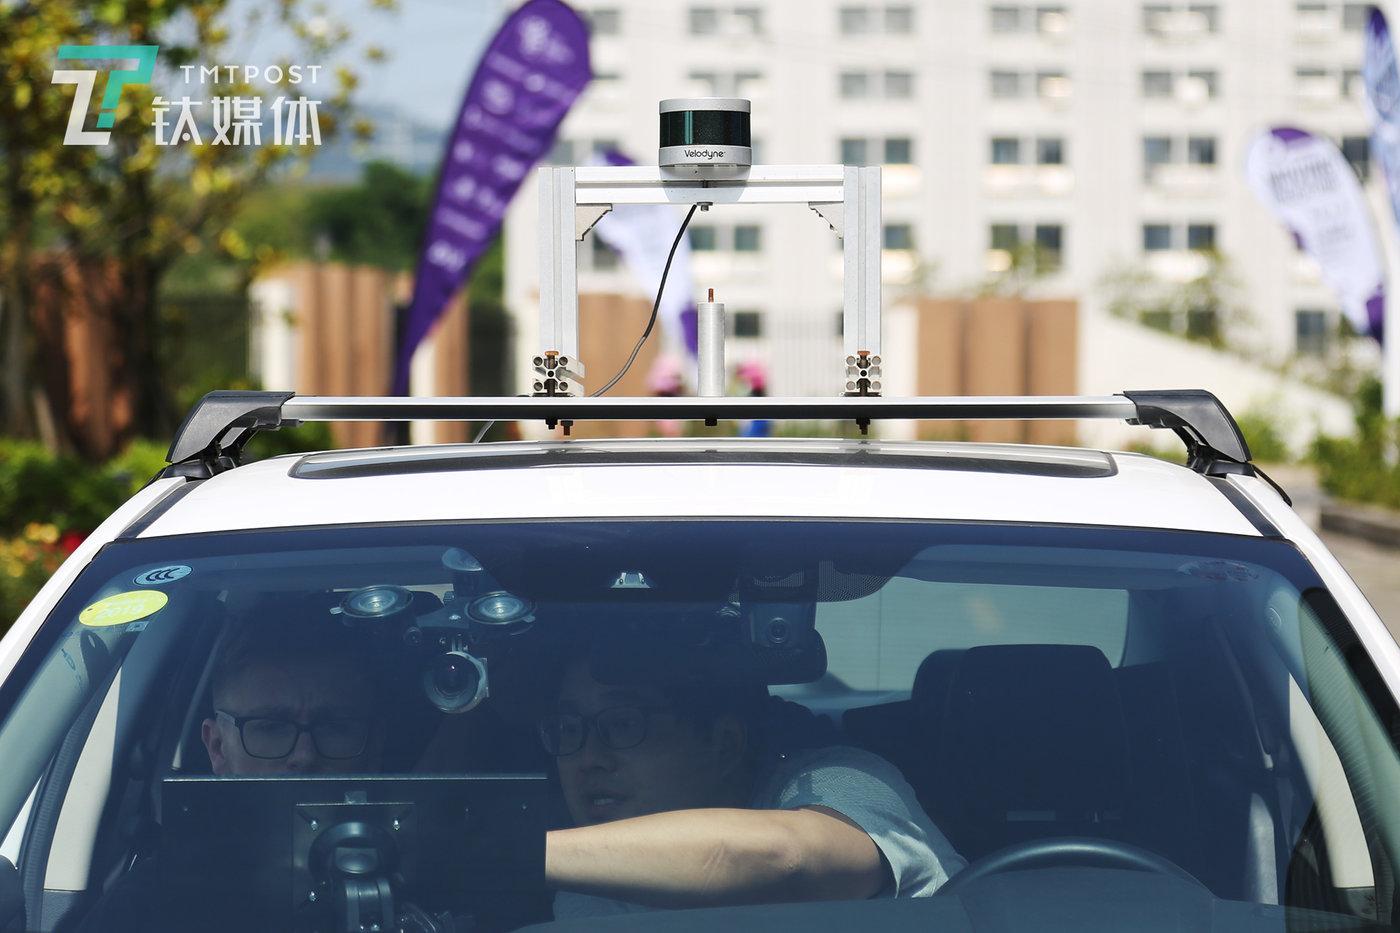 "D队队长马臻和  ""2 EASY队""队长Sam和 ""D队""队长马臻在和工程师在车内调整数据,赛事主办方准备的车辆只配备了Velodyne 16线激光雷达和单目摄像头作为传感器。"